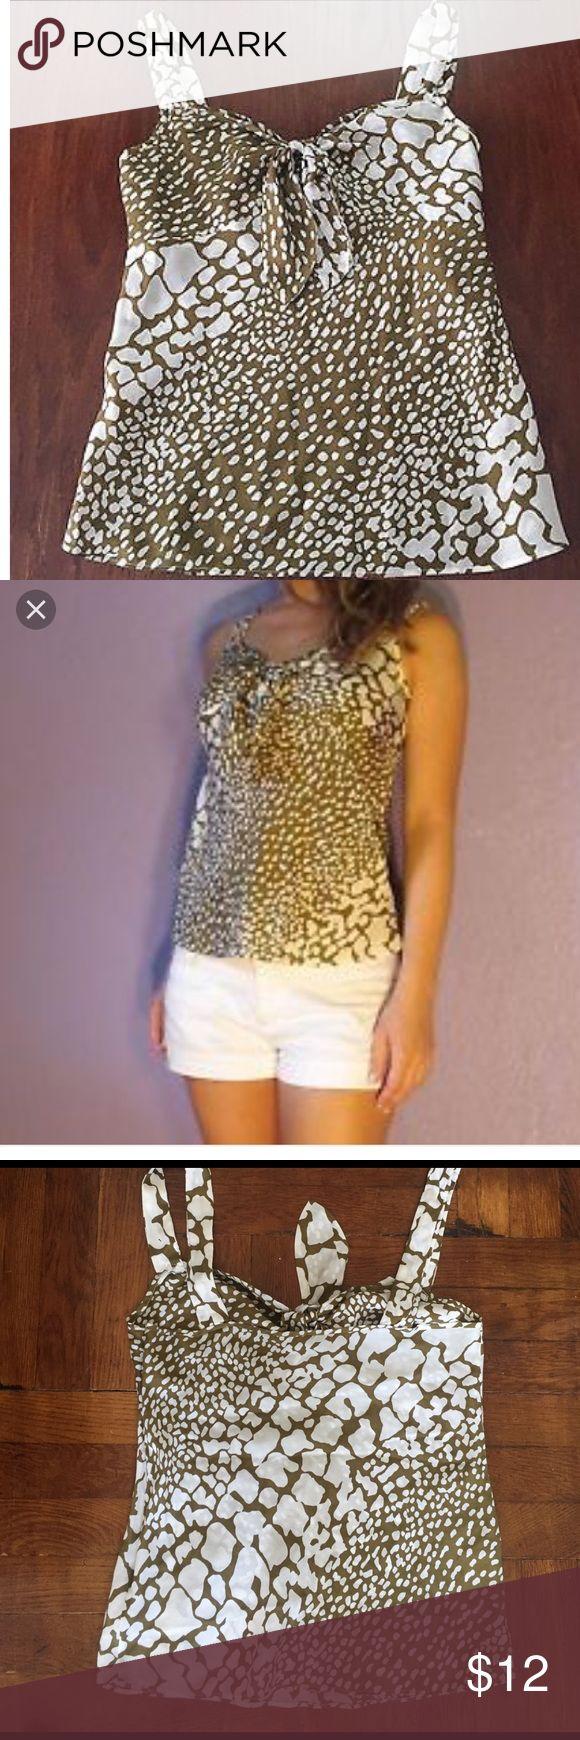 J Crew 100% silk python print blouse. NWOT 100% silk python print blouse J CREW. Perfect condition, never worn! Size 4, olive green J. Crew Tops Blouses